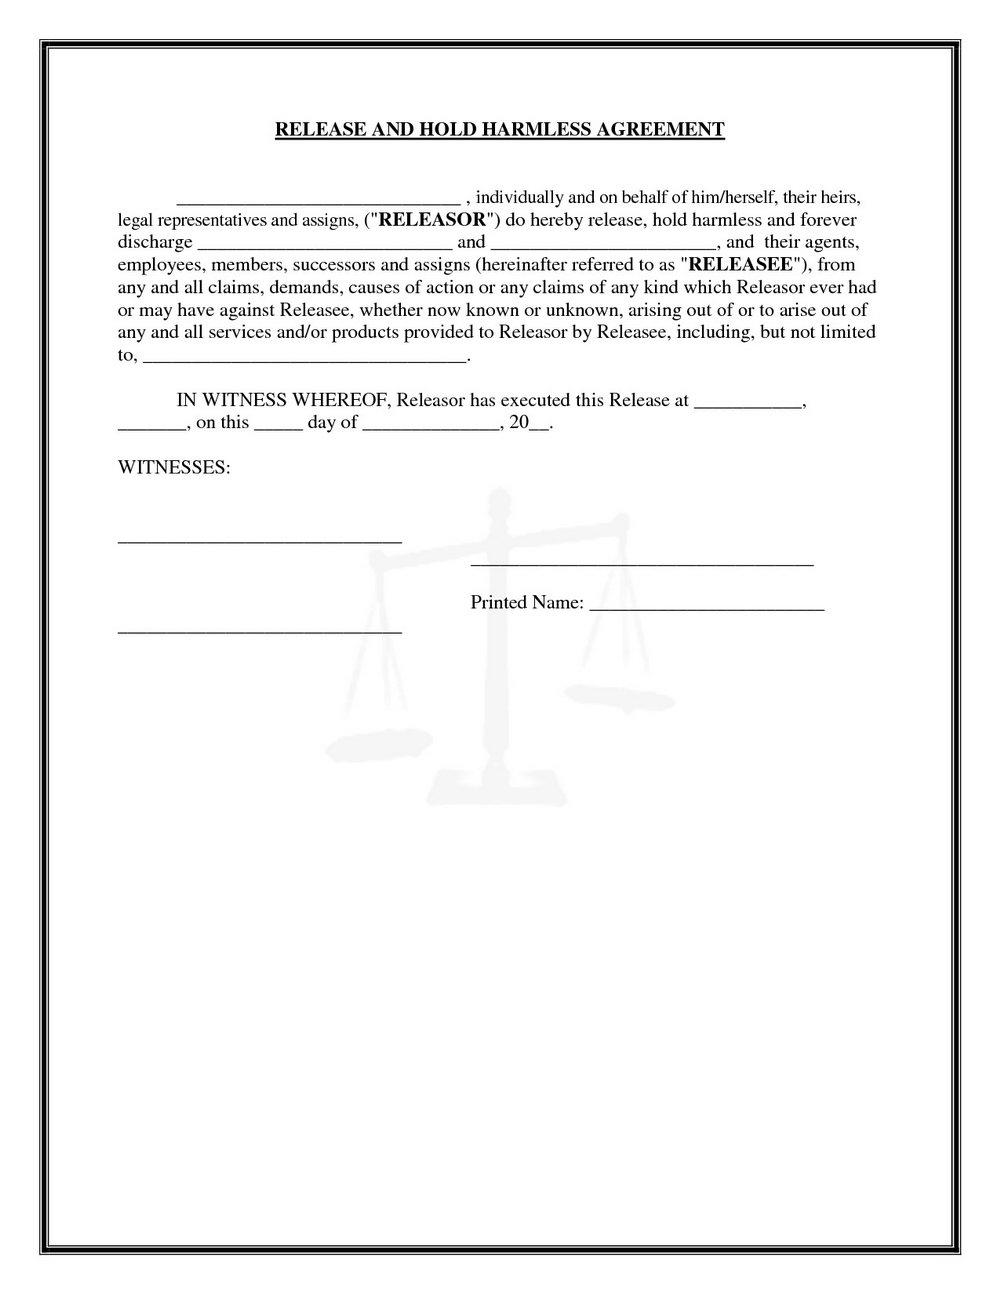 Hold Harmless Agreement Template Canada